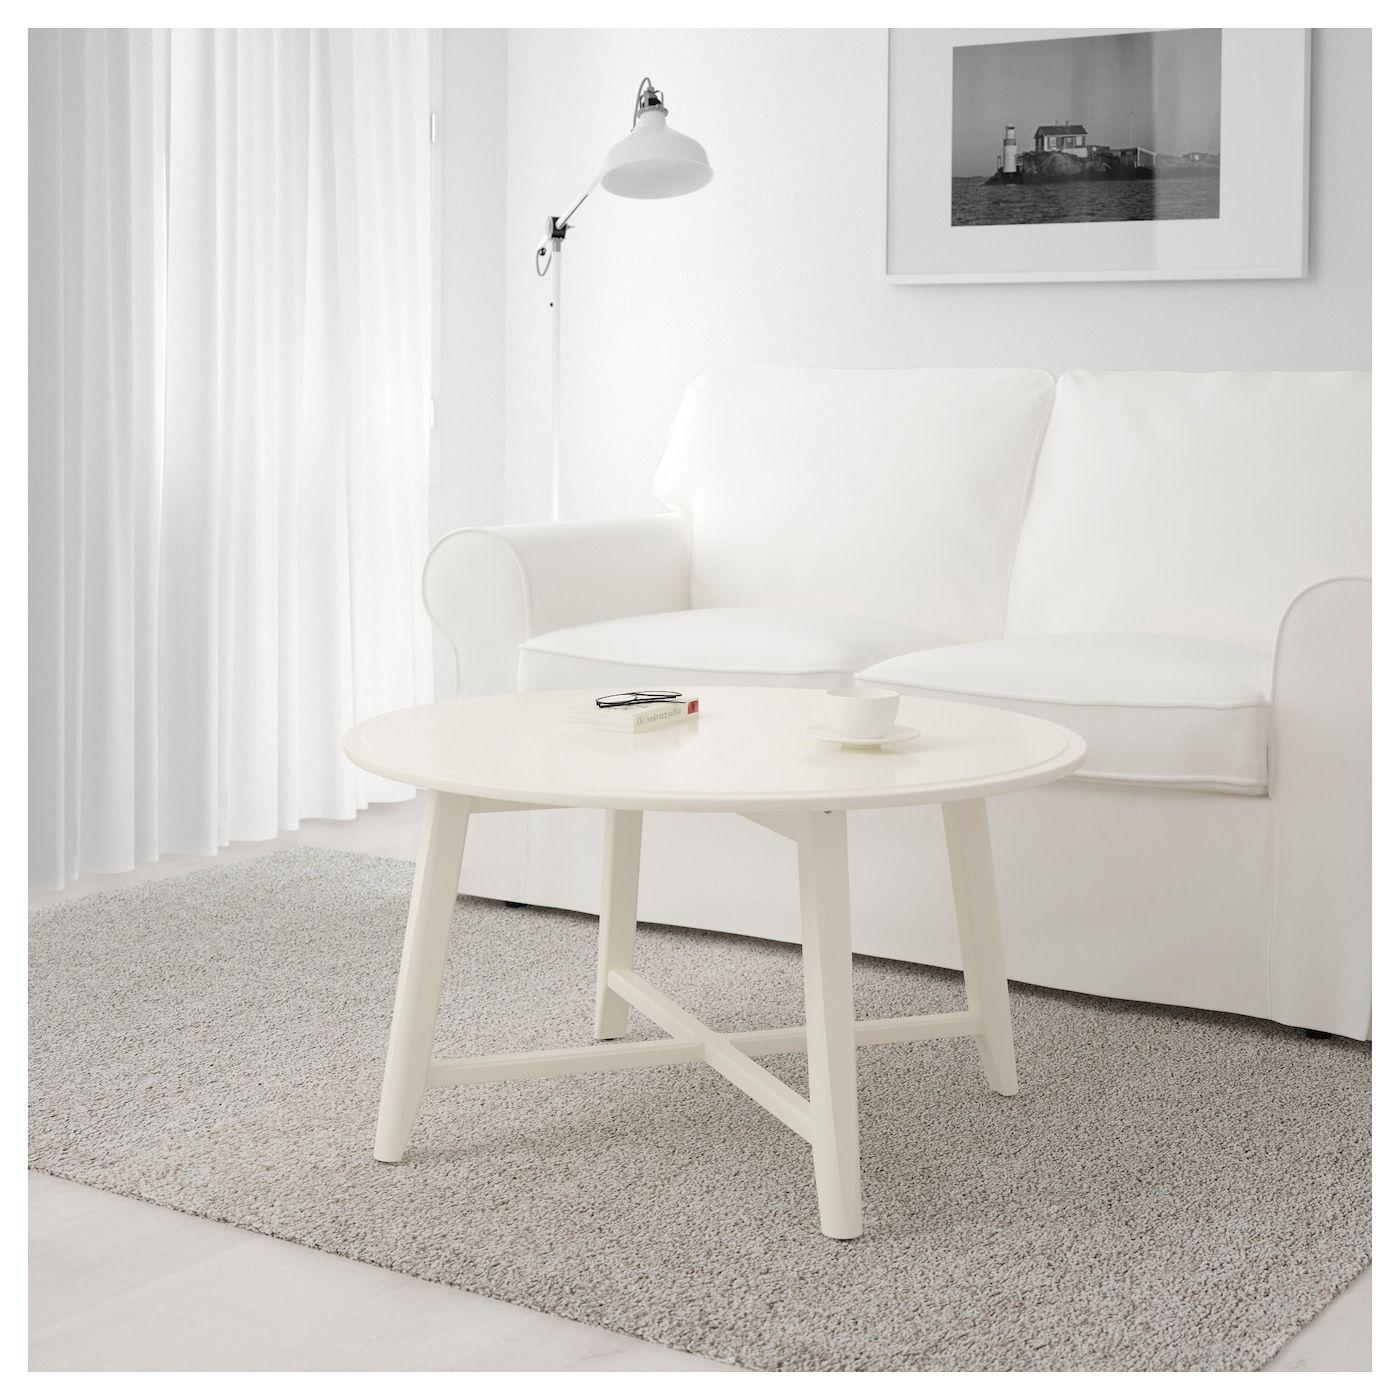 Kragsta coffee table white 35 38 ikea coffee table